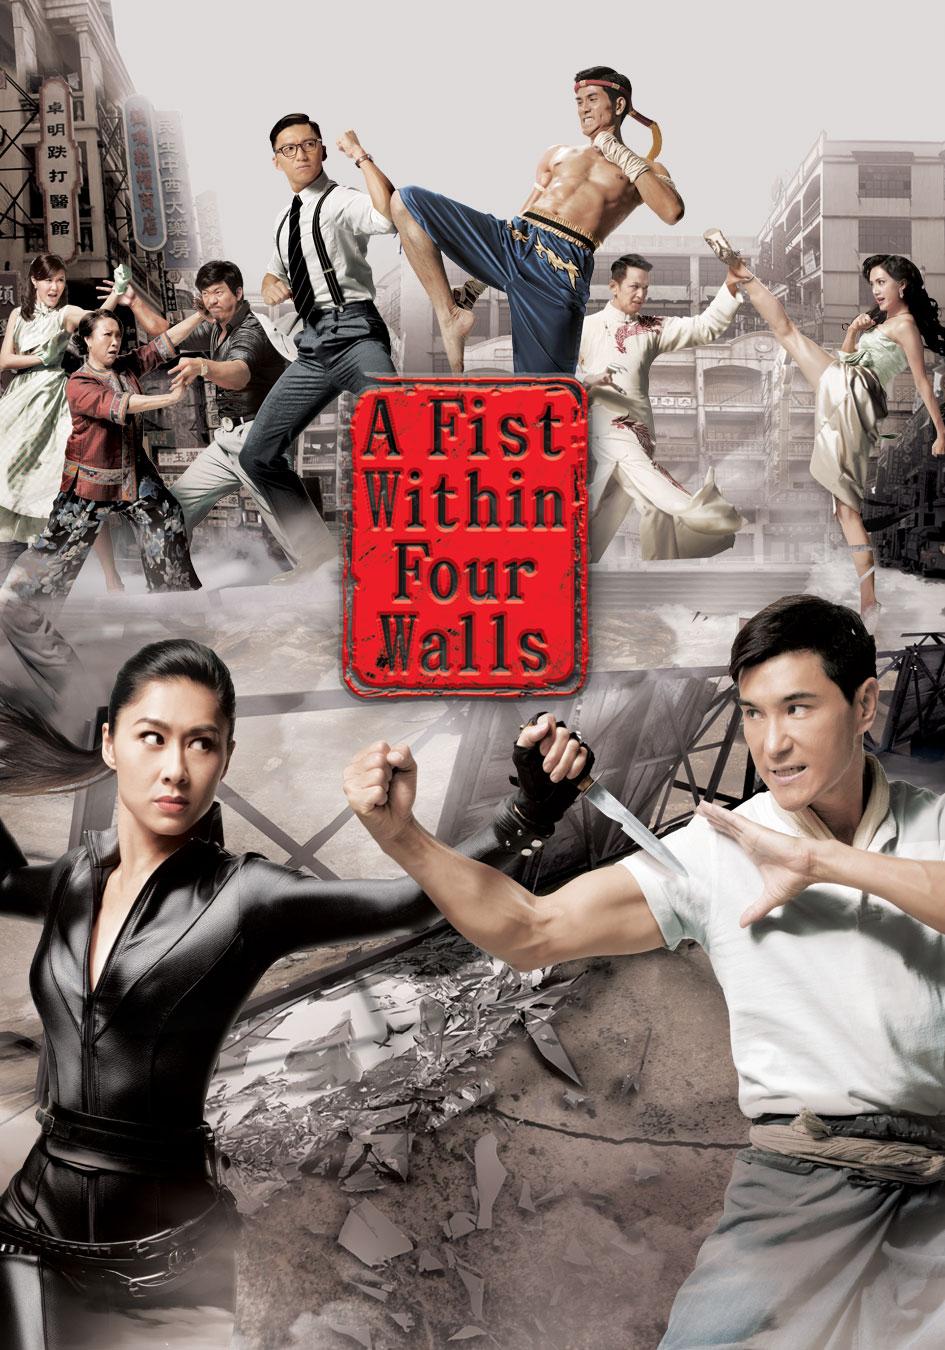 A Fist Within Four Walls-A Fist Within Four Walls